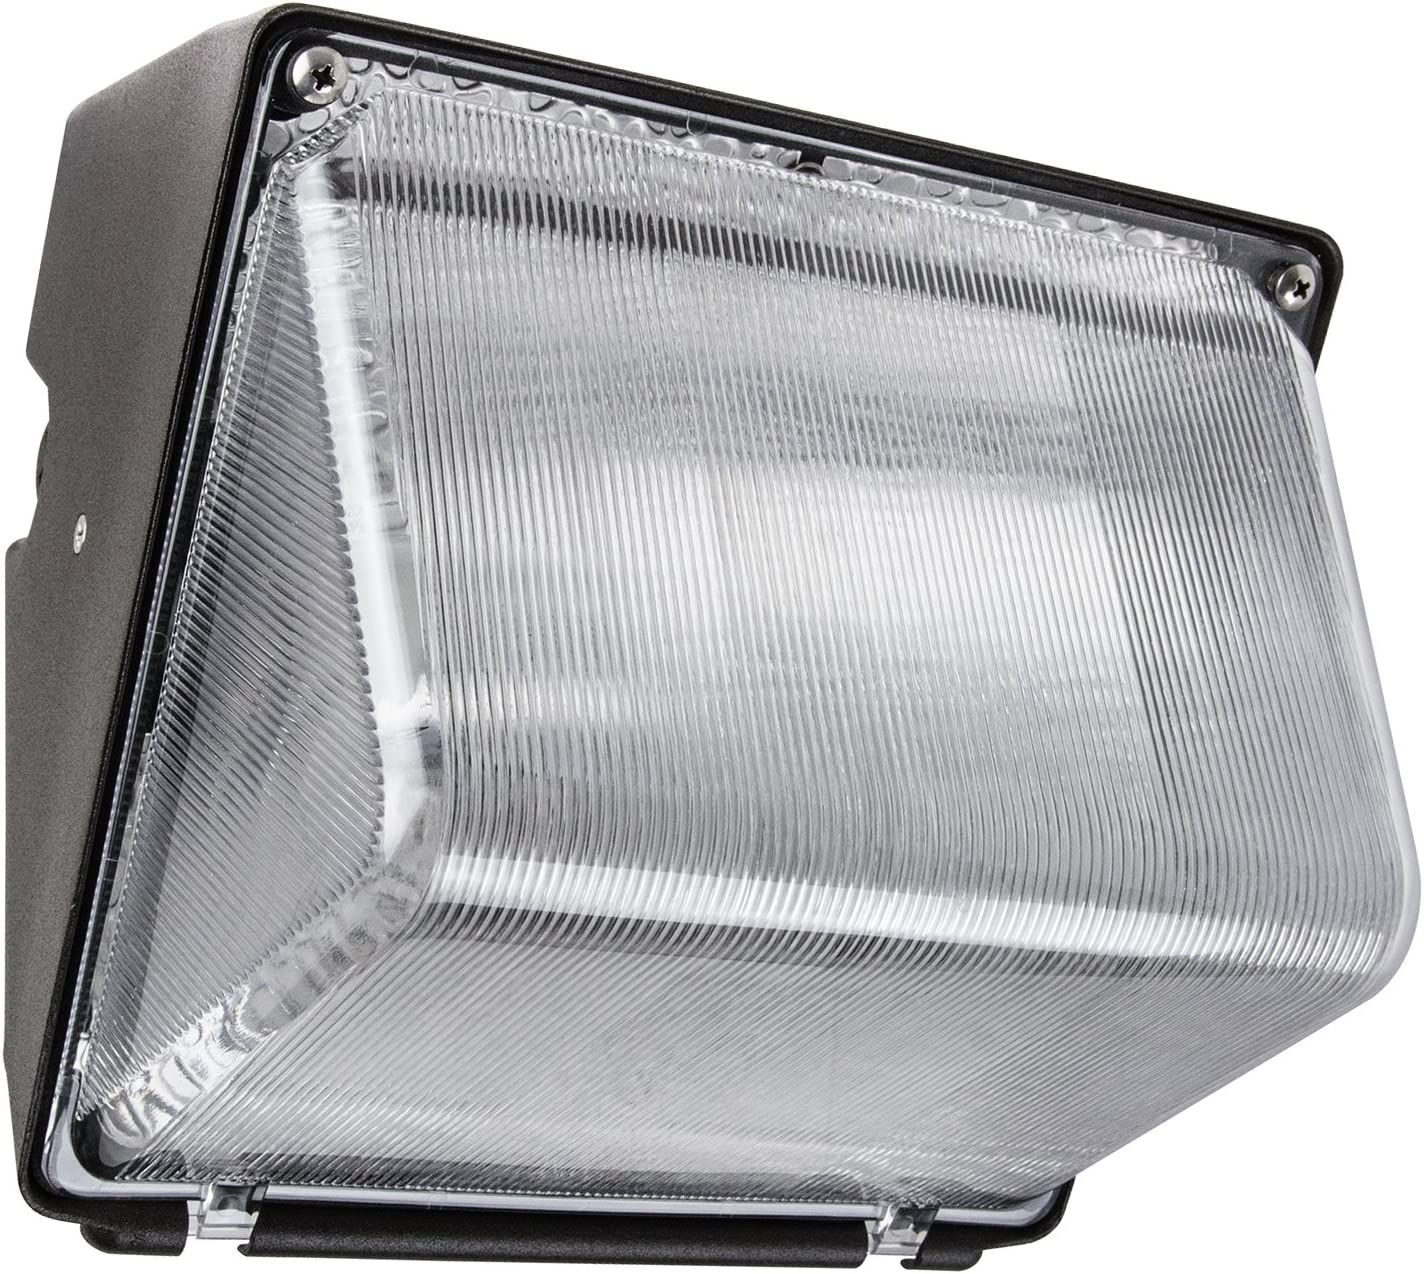 Sunlite 04930-SU WPS50MH 50-watt Metal Halide Wall Pack Fixture, Small